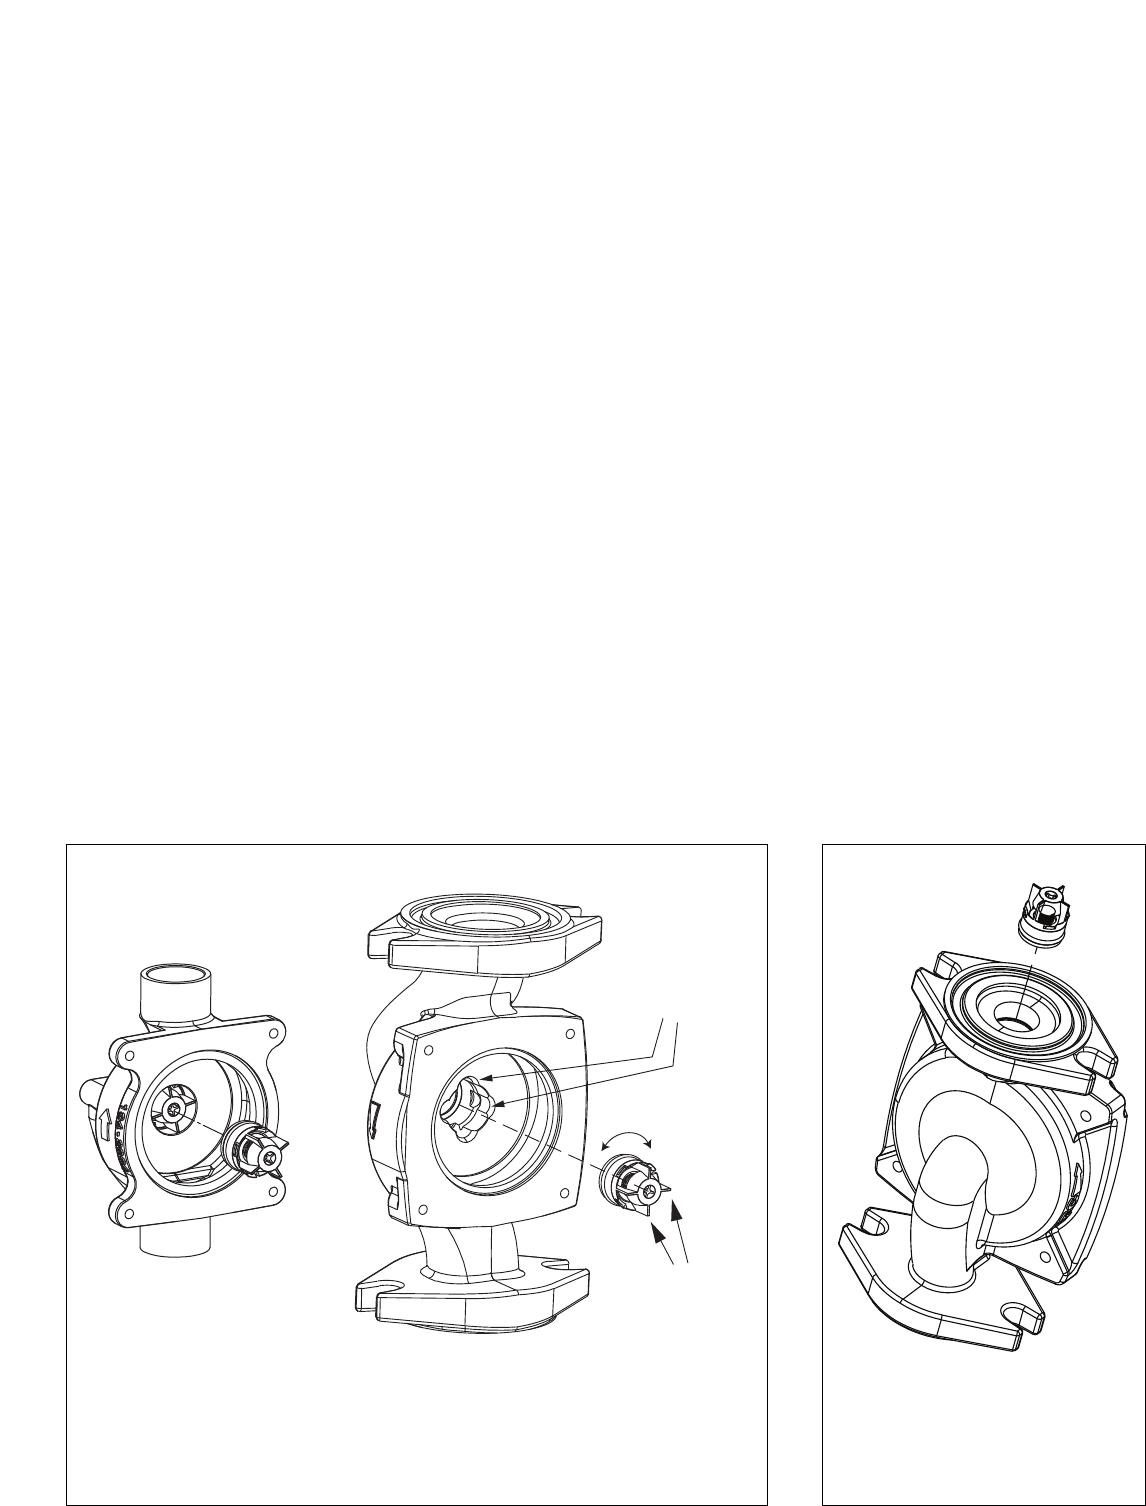 12590 4 Taco 0011 Sf4 Ifc Instructions em1 Sheet1 User Manual on